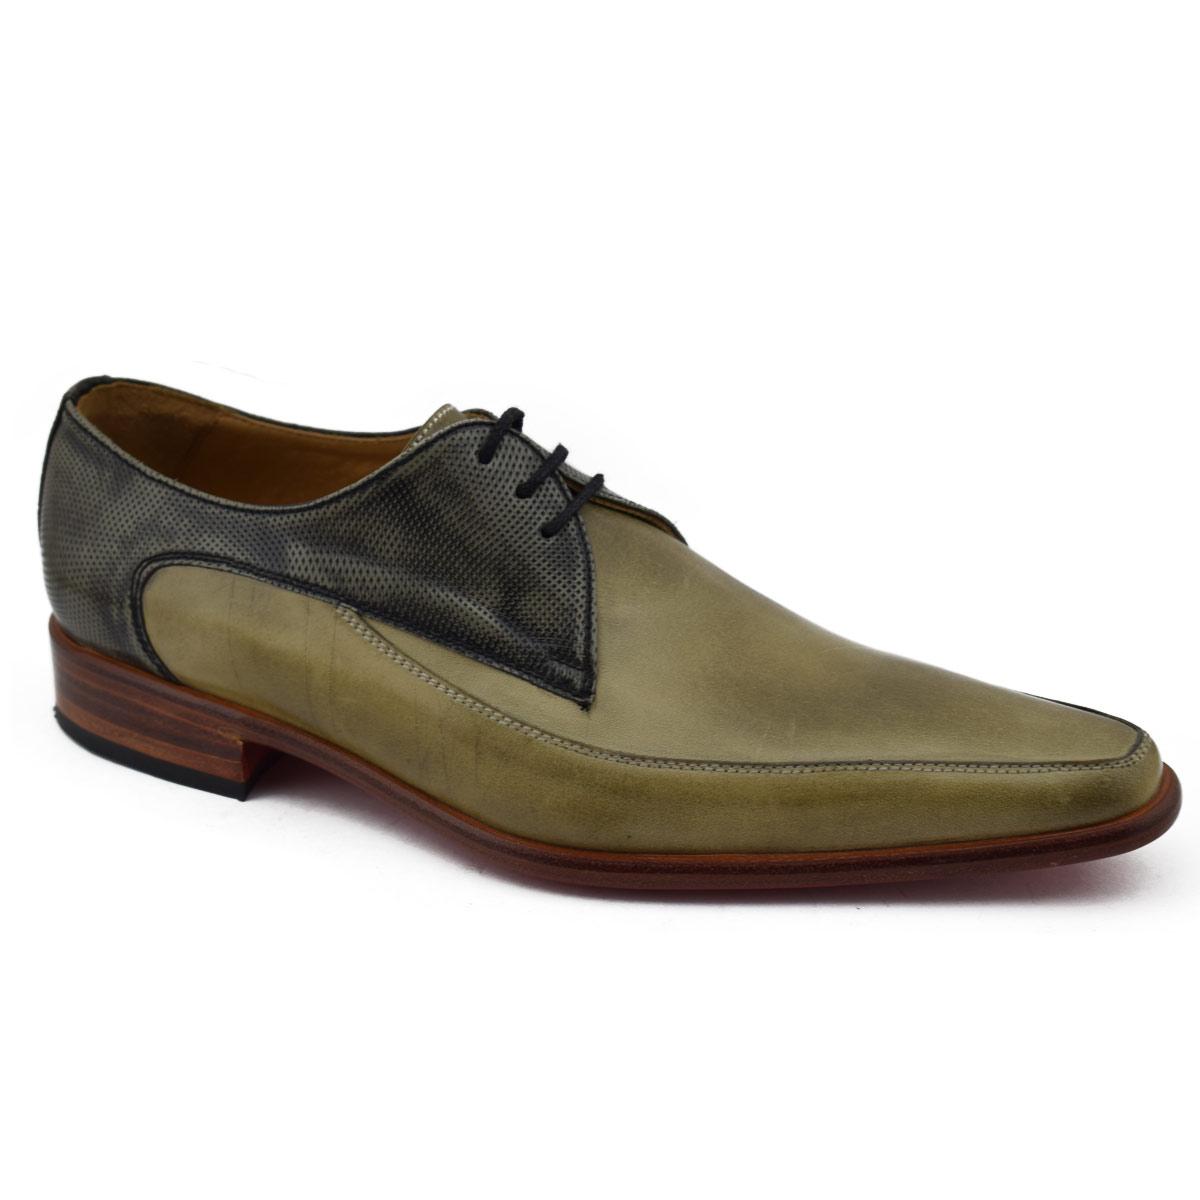 dec6e5127c5 zapatos-hombre-ofertas-sale-dino-butelli